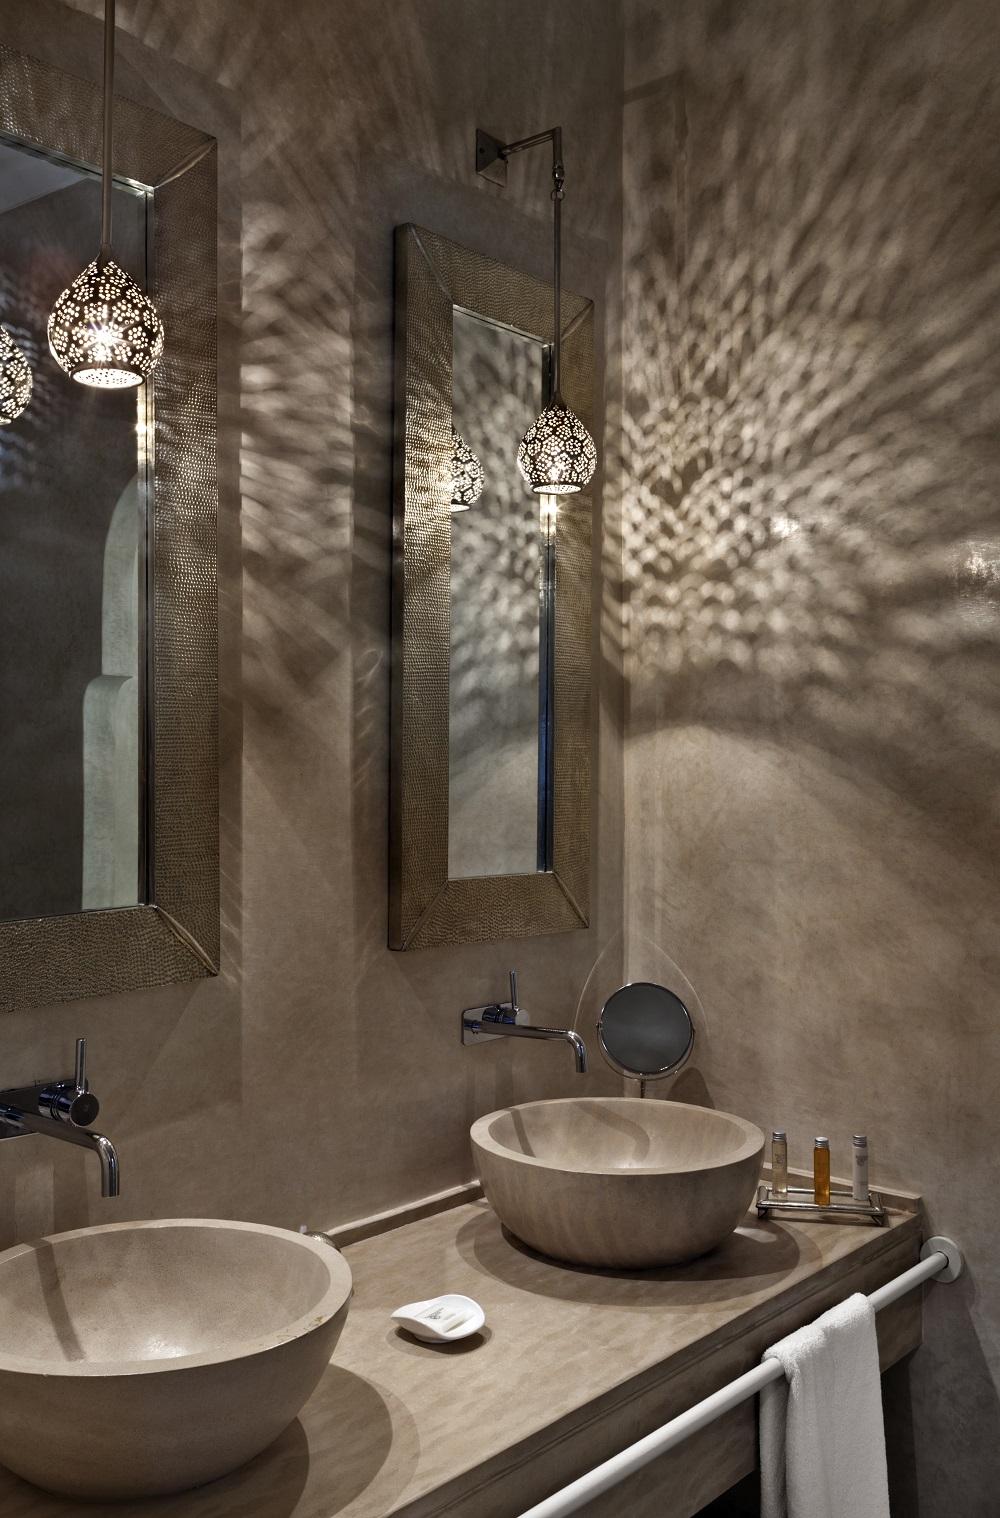 La salle de bain du Riad Nashira.